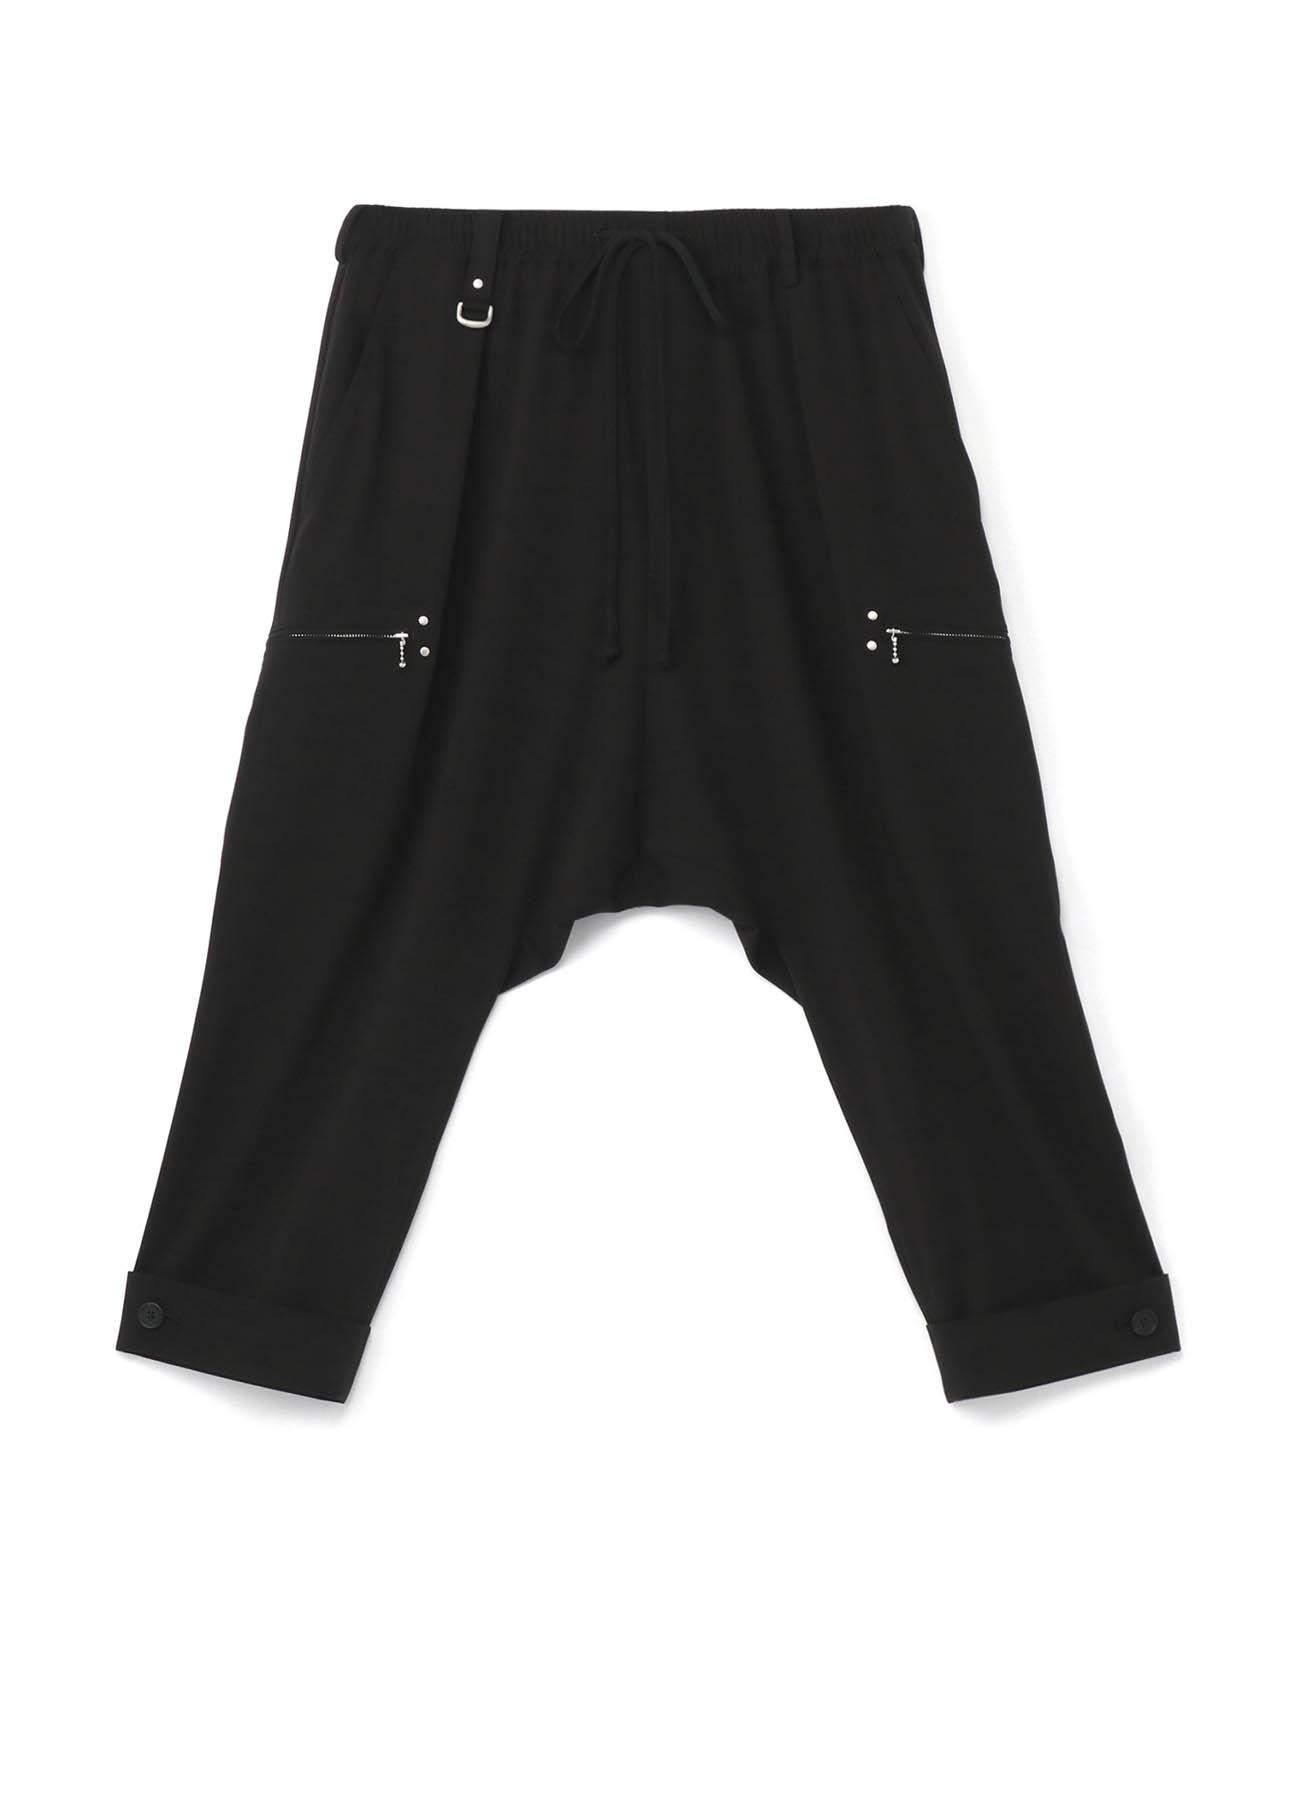 Pe/Rayon Gabardine Stretch Studs Slim Mackin Sarouel Pants